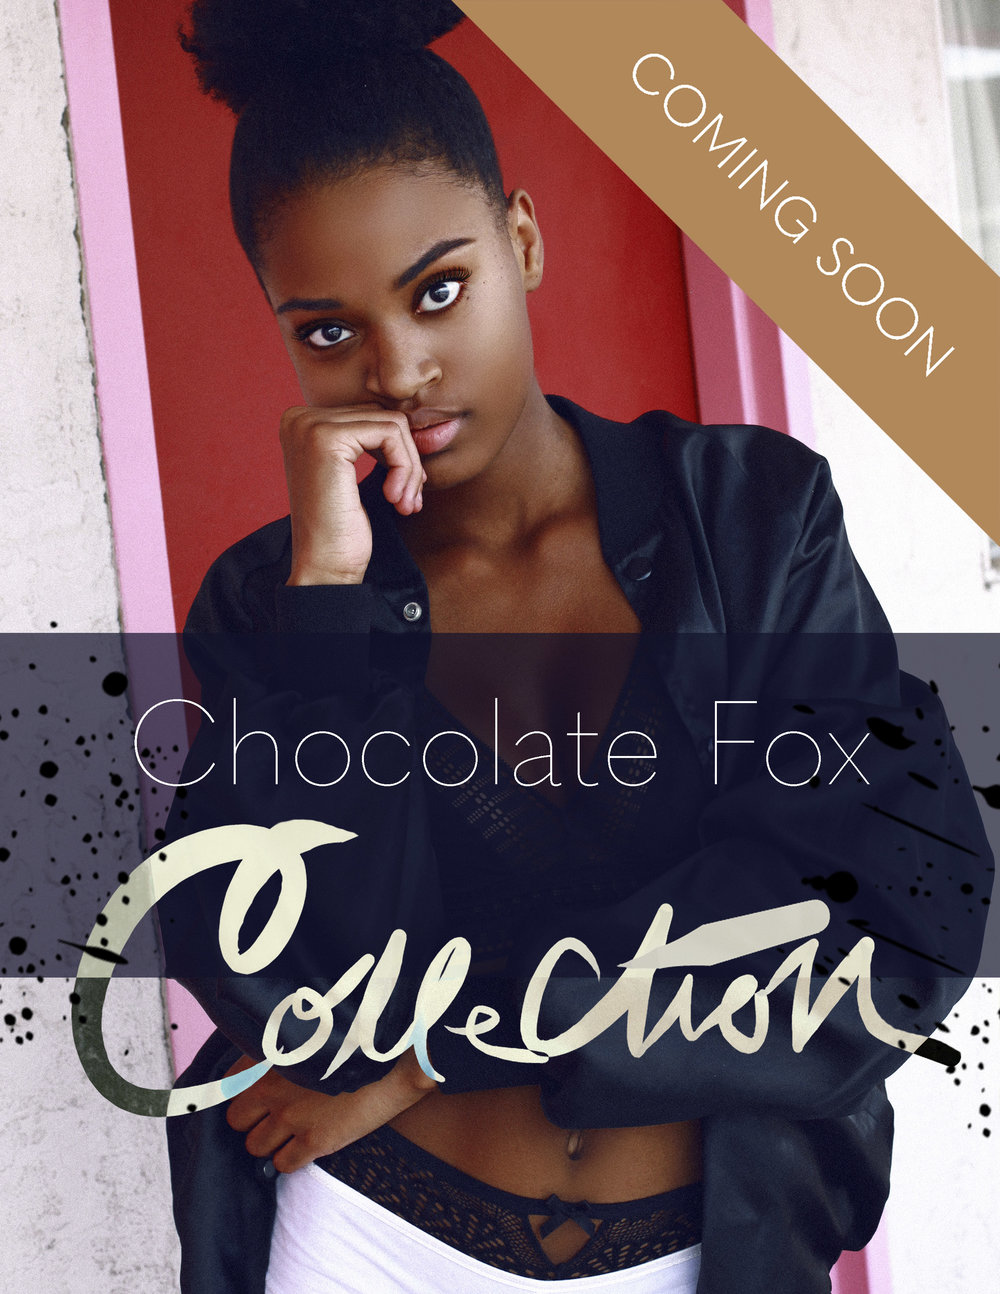 Chocolate Fox Collection Photoshop Actions - Dark Black Skin Tones - SHOP Photographer Alyssa Risley @alyssarisley